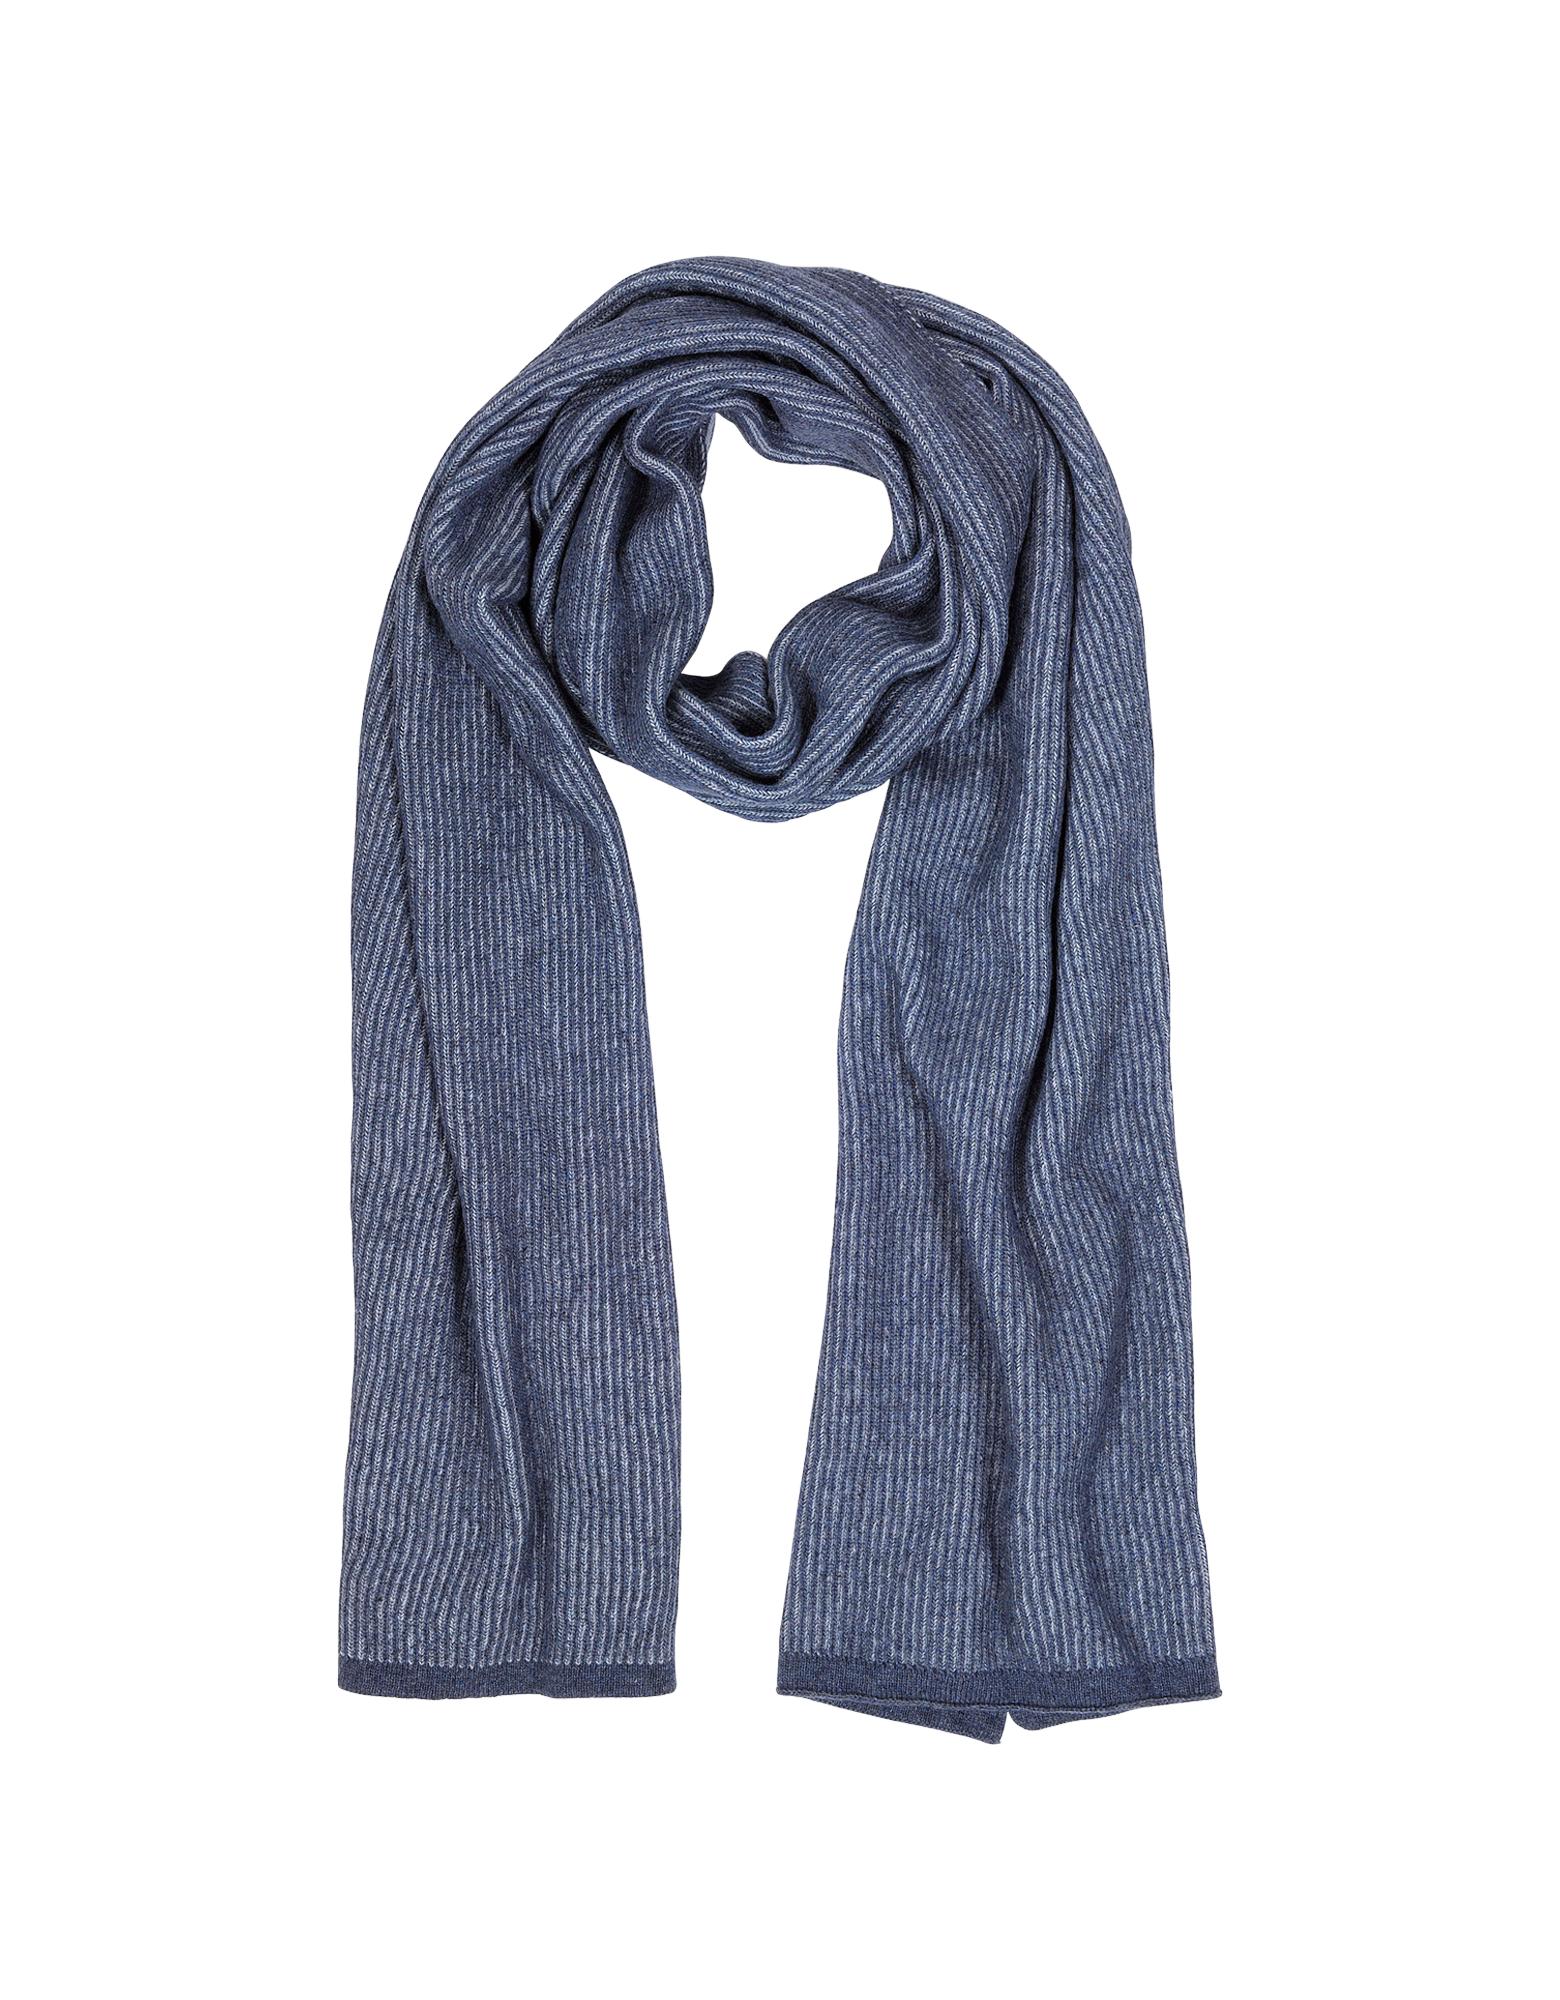 Image of Blue/Light Blue Stripe Wool Blend Long Scarf